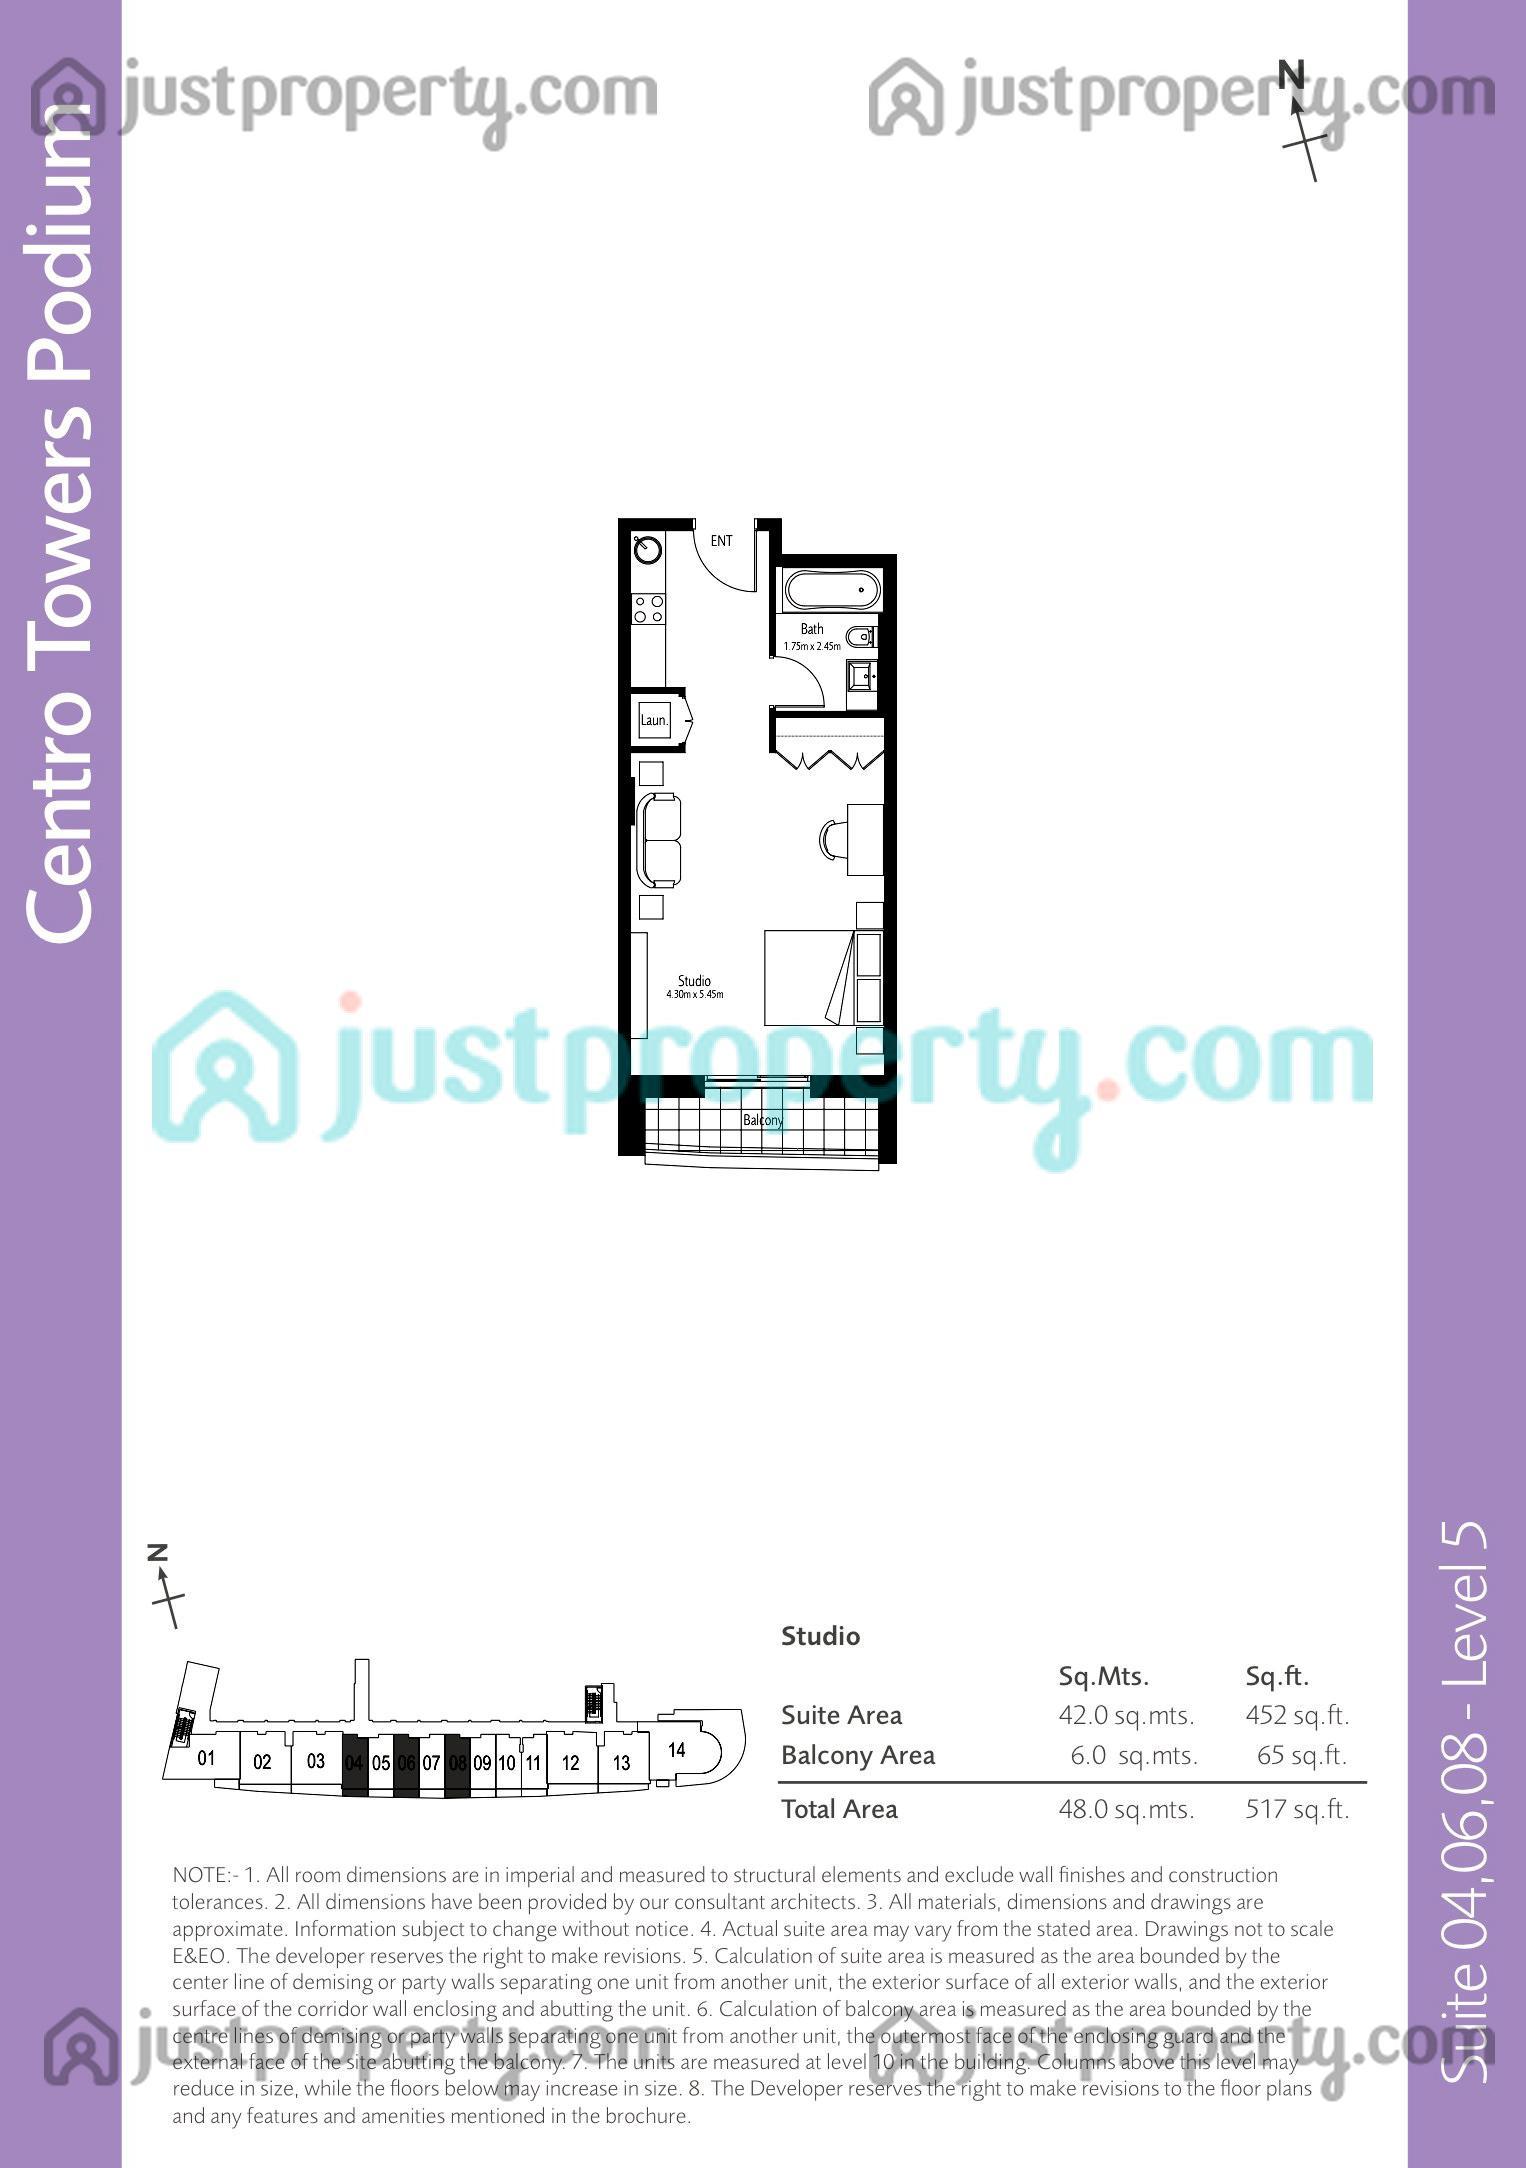 Boulevard Central Podium Floor Plans | JustProperty com